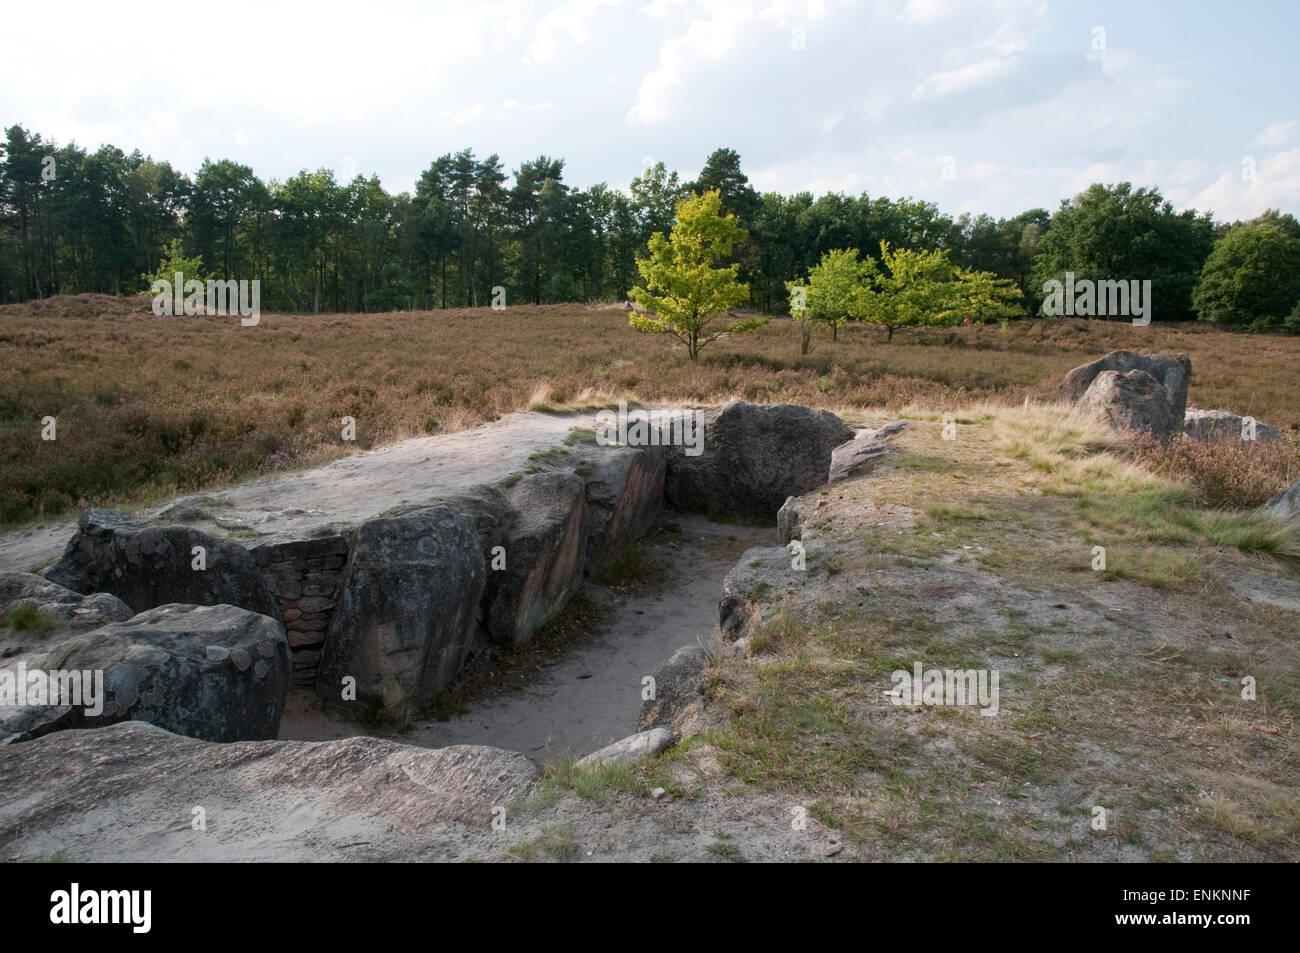 megalithic tomb, Oldendorfer Totenstatt, Lueneburger Heide, Lower Saxony, Germany Stock Photo